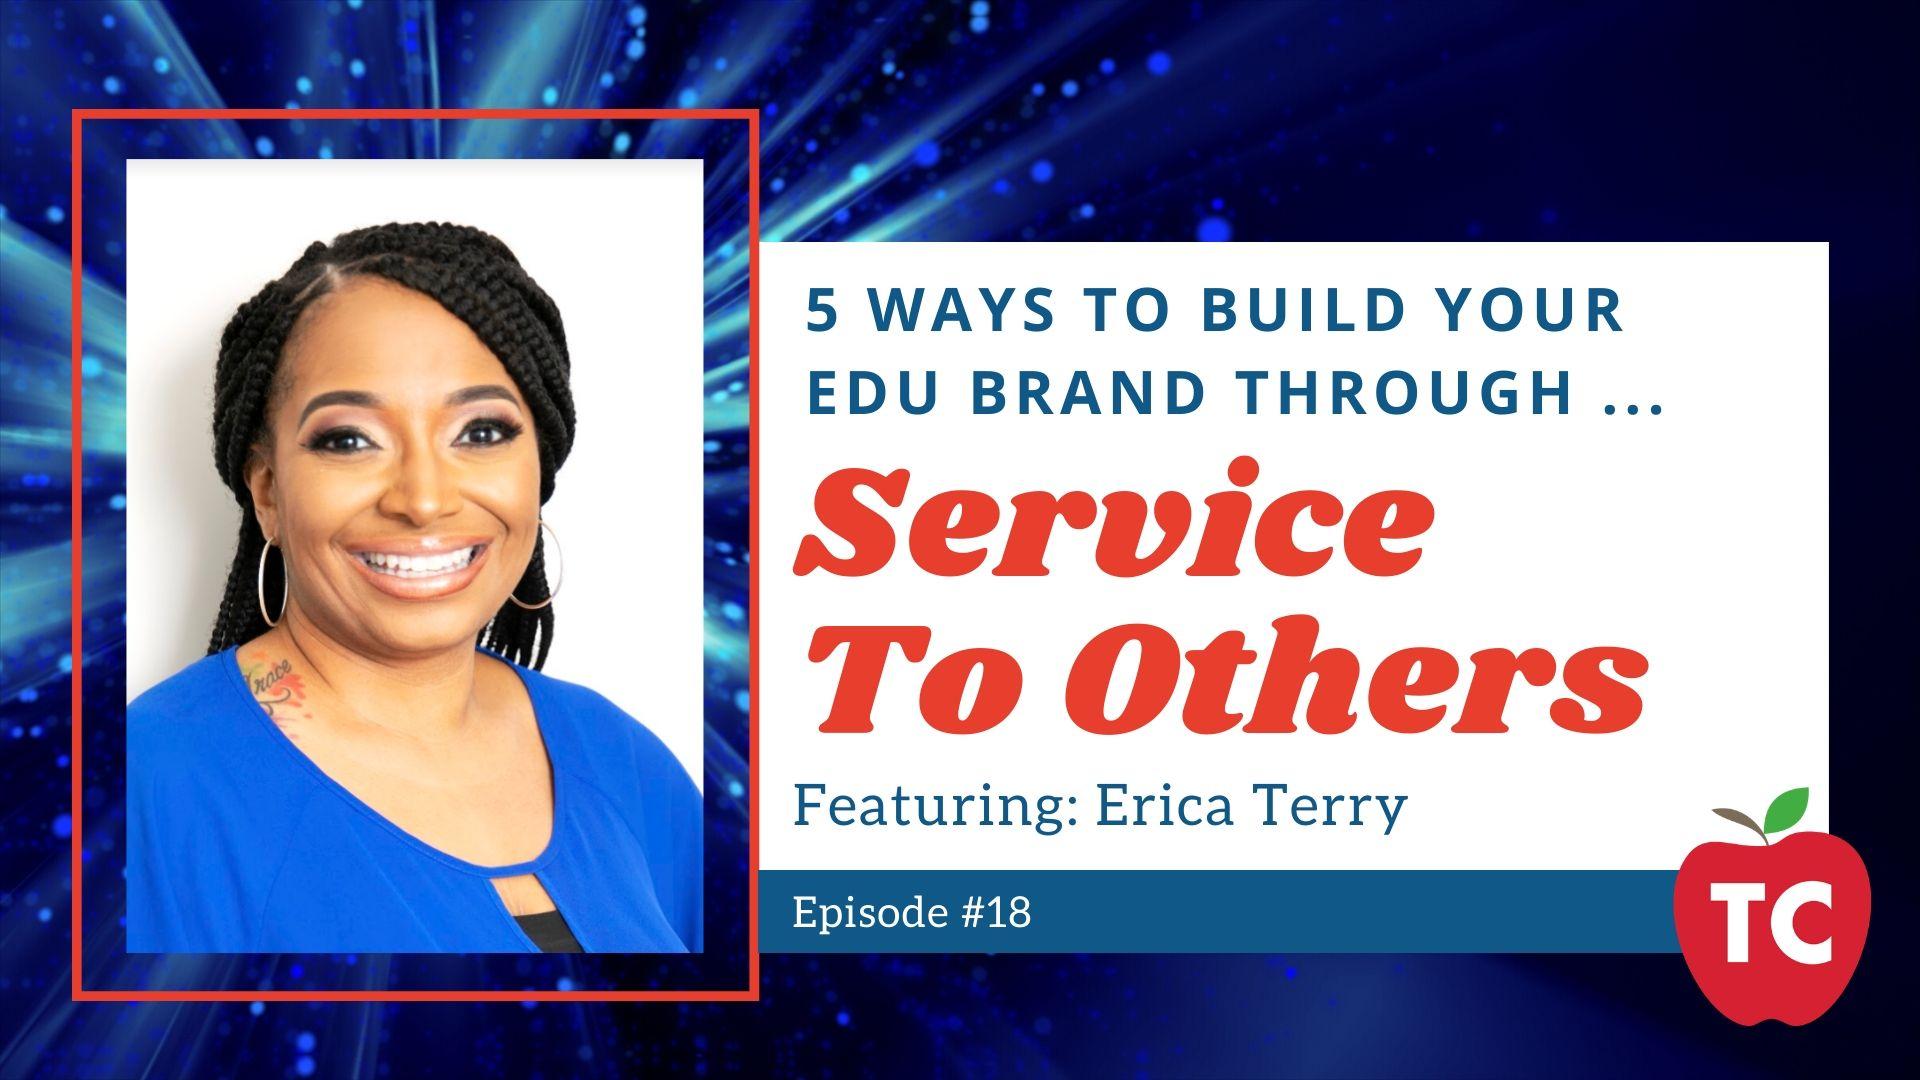 5 Ways To Build Your EDU Brand